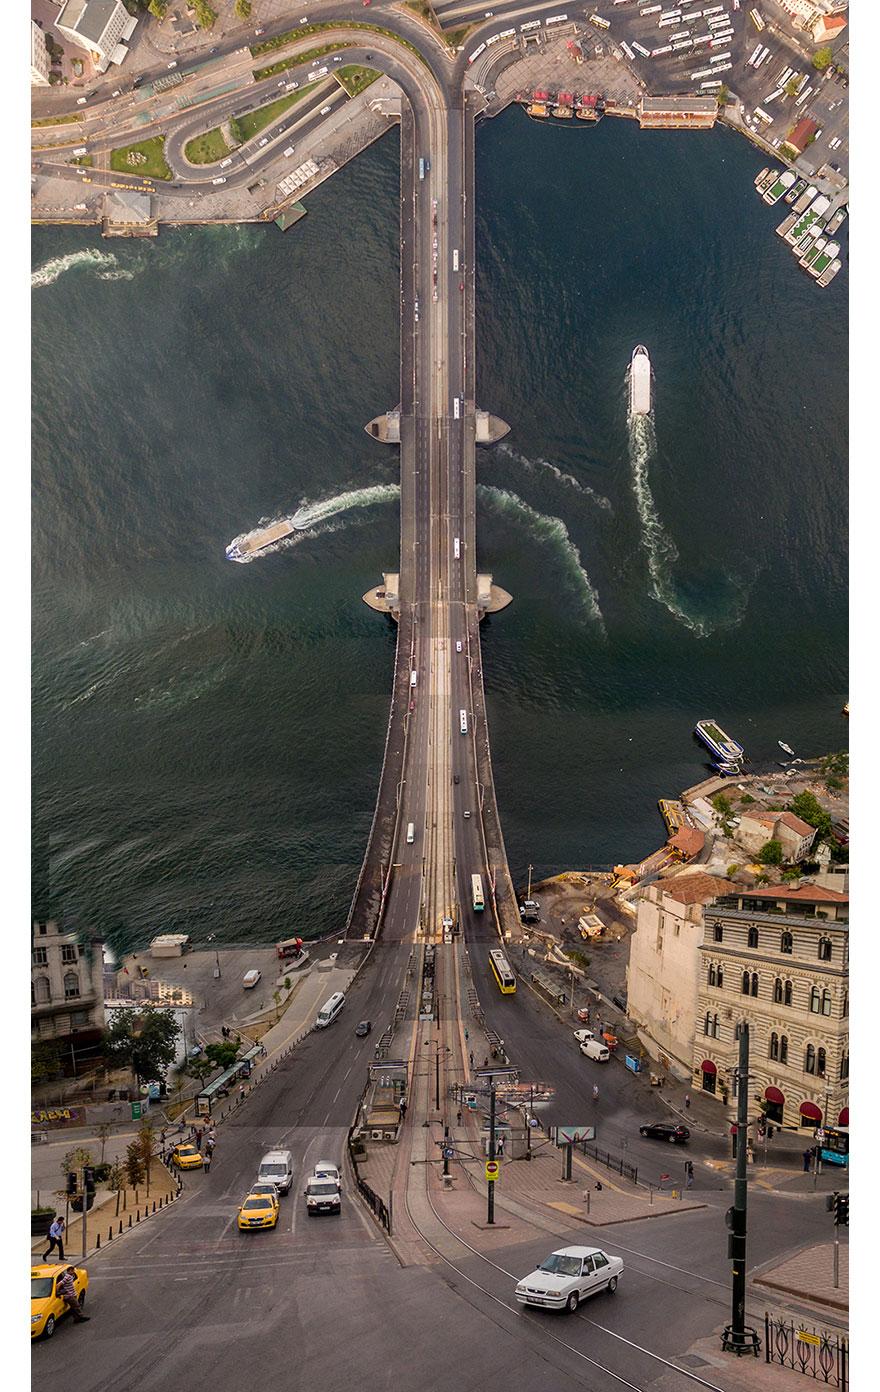 inception-istanbul-surreal-city-landscape-flatland-aydin-buyuktas-10